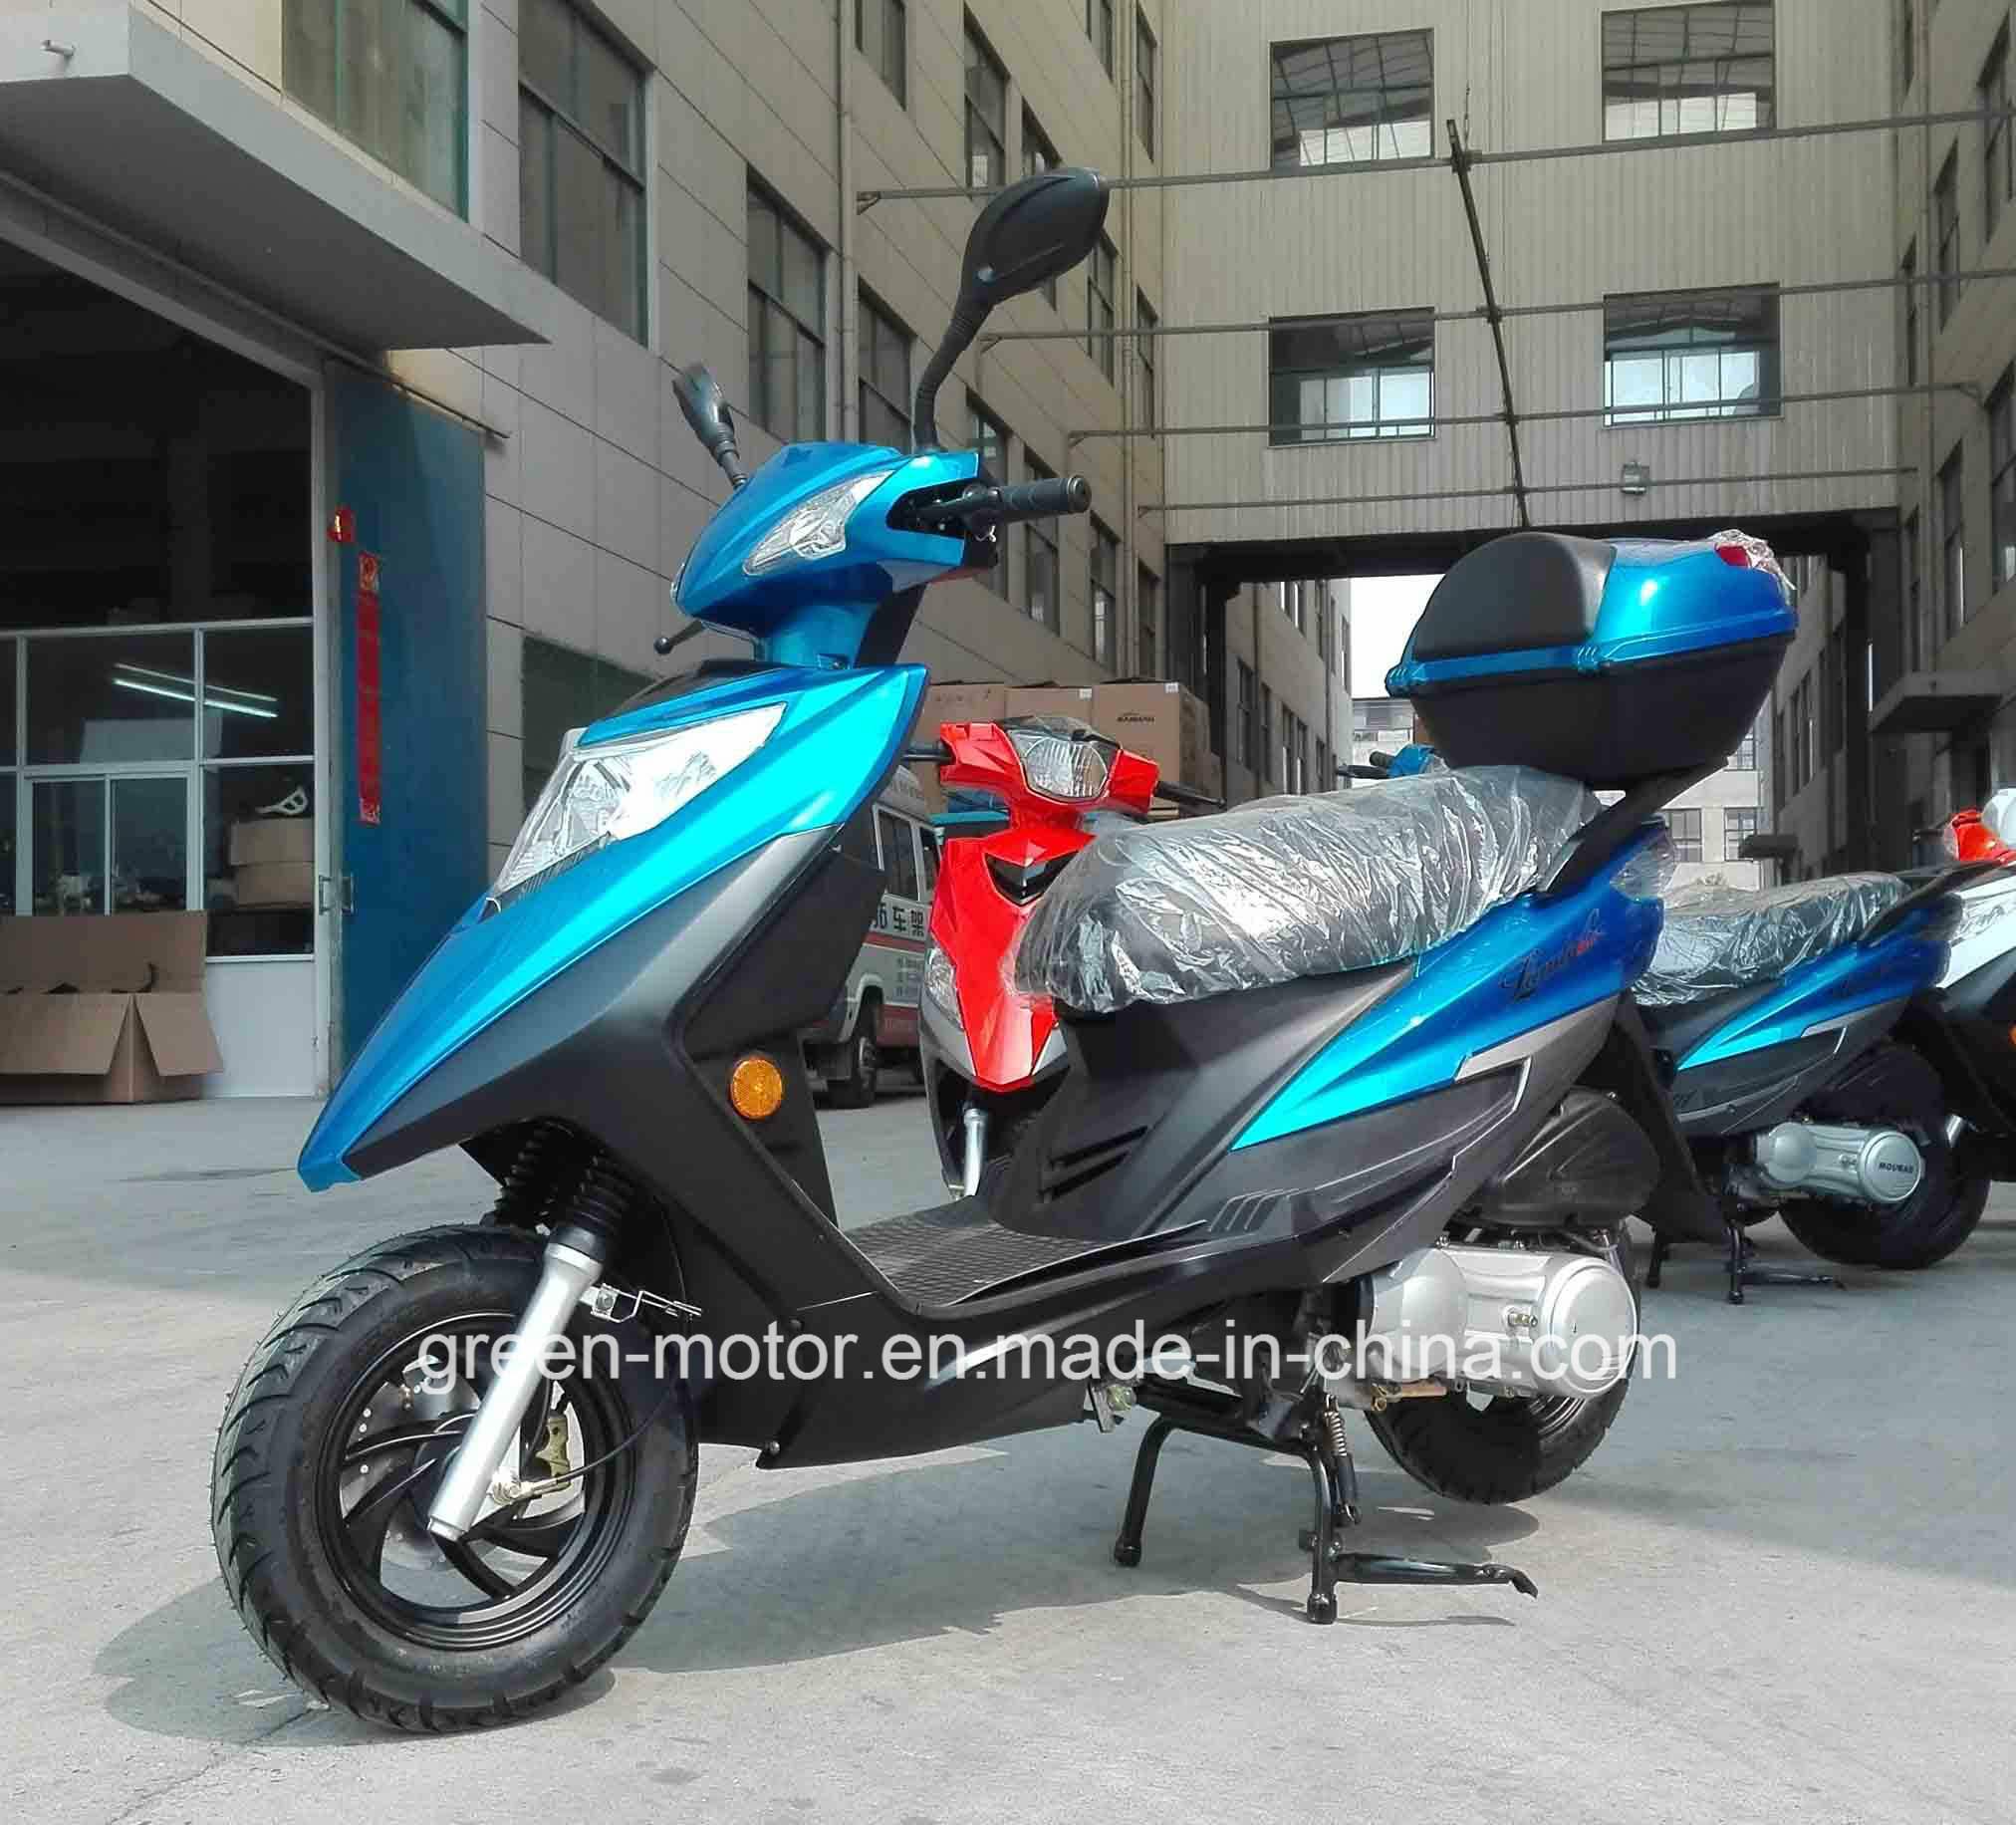 100cc/125cc/150cc Gas Scooter, Gas Scooter, Honda Scooter (with New 100cc Honda Engine)